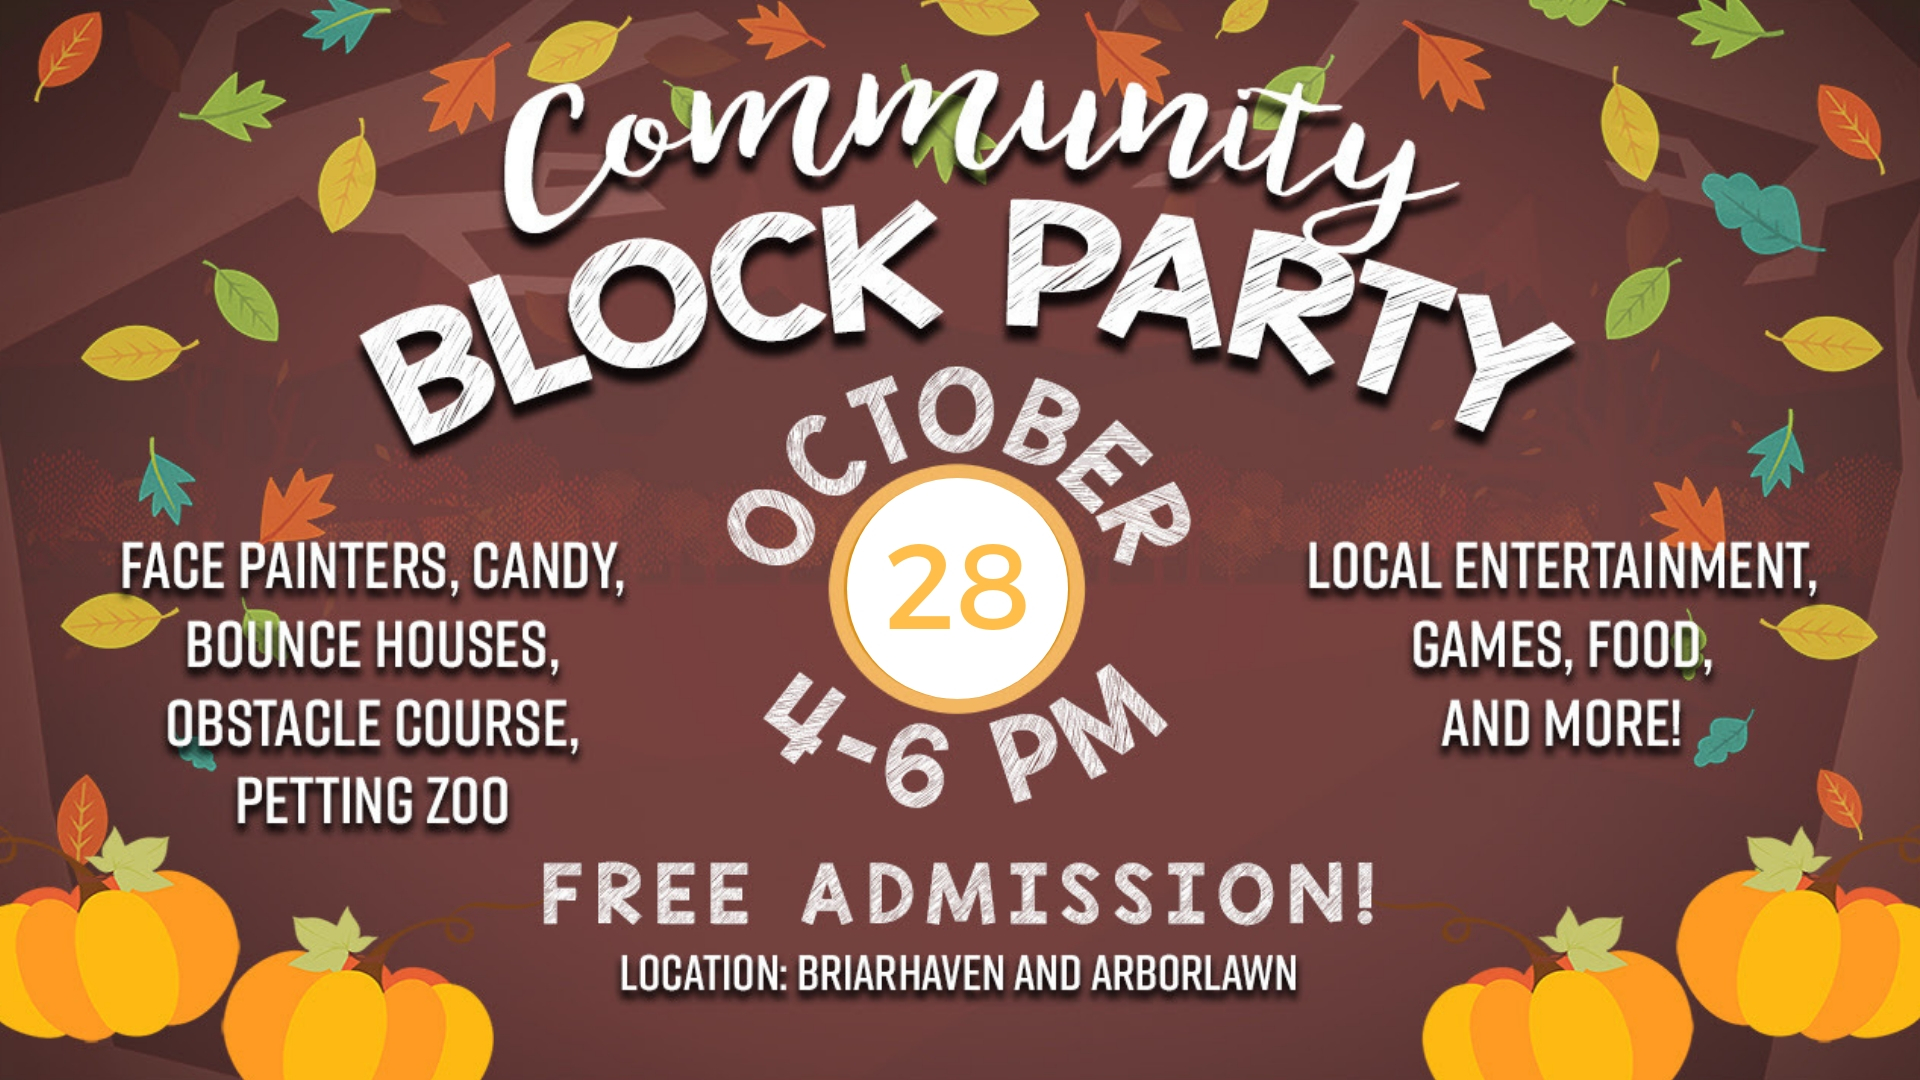 CommUNITY Block Party 2018.jpg